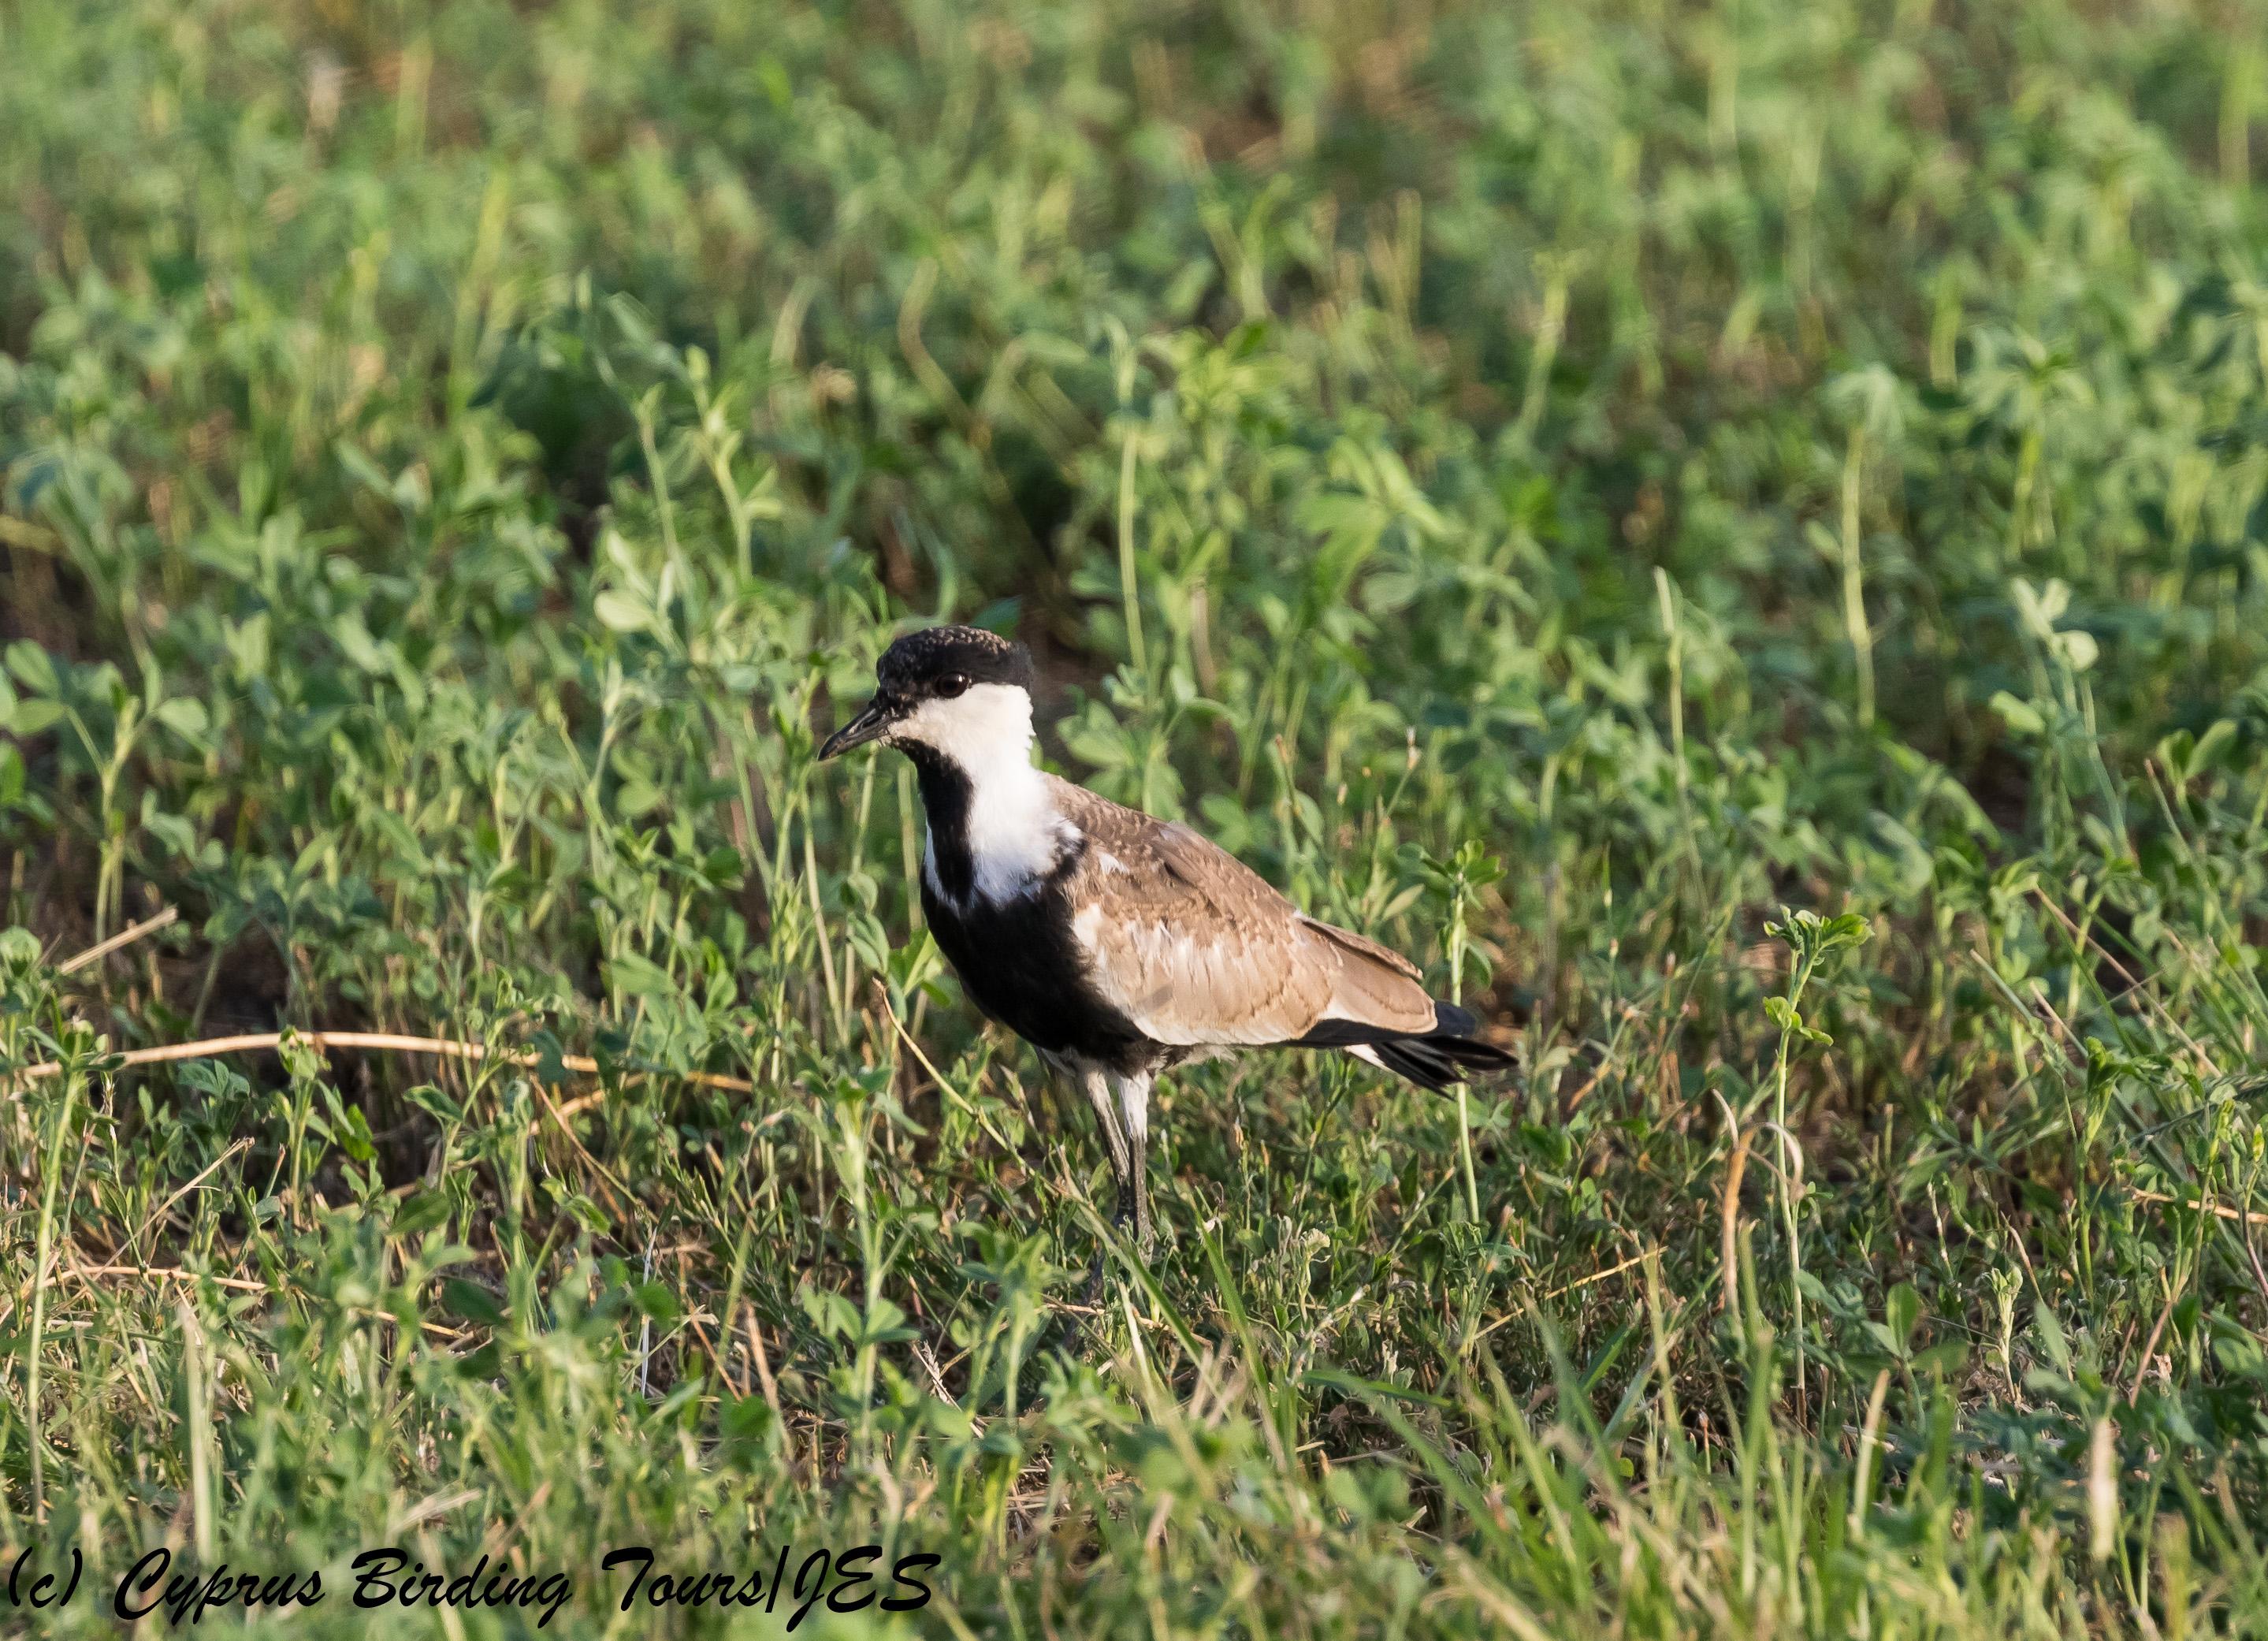 Spur-winged Lapwing juvenile , Paphos Sewage Plant 21st September 2017 (c) Cyprus Birding Tours